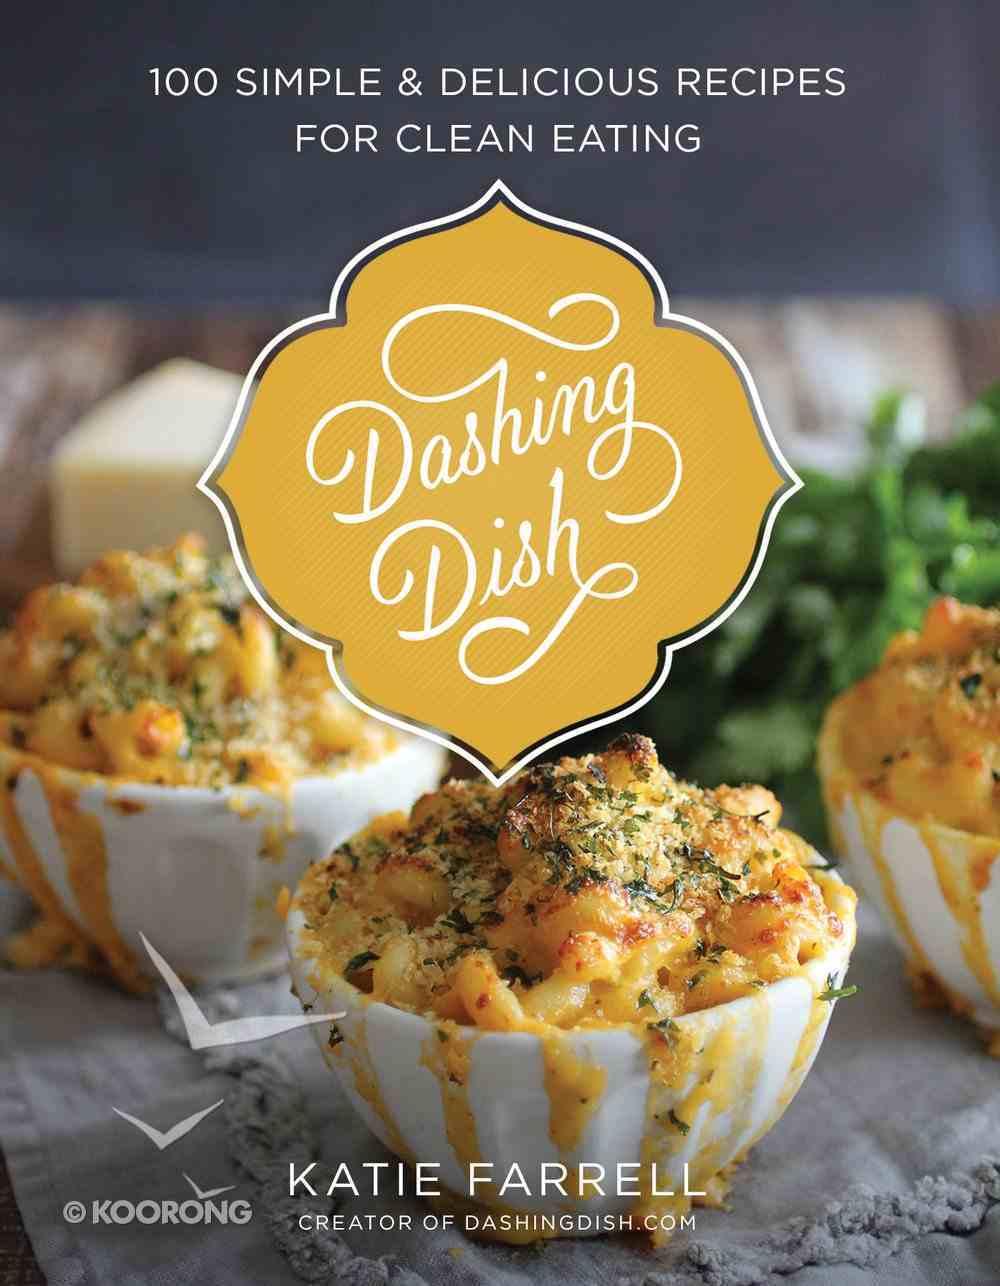 Dashing Dish eBook